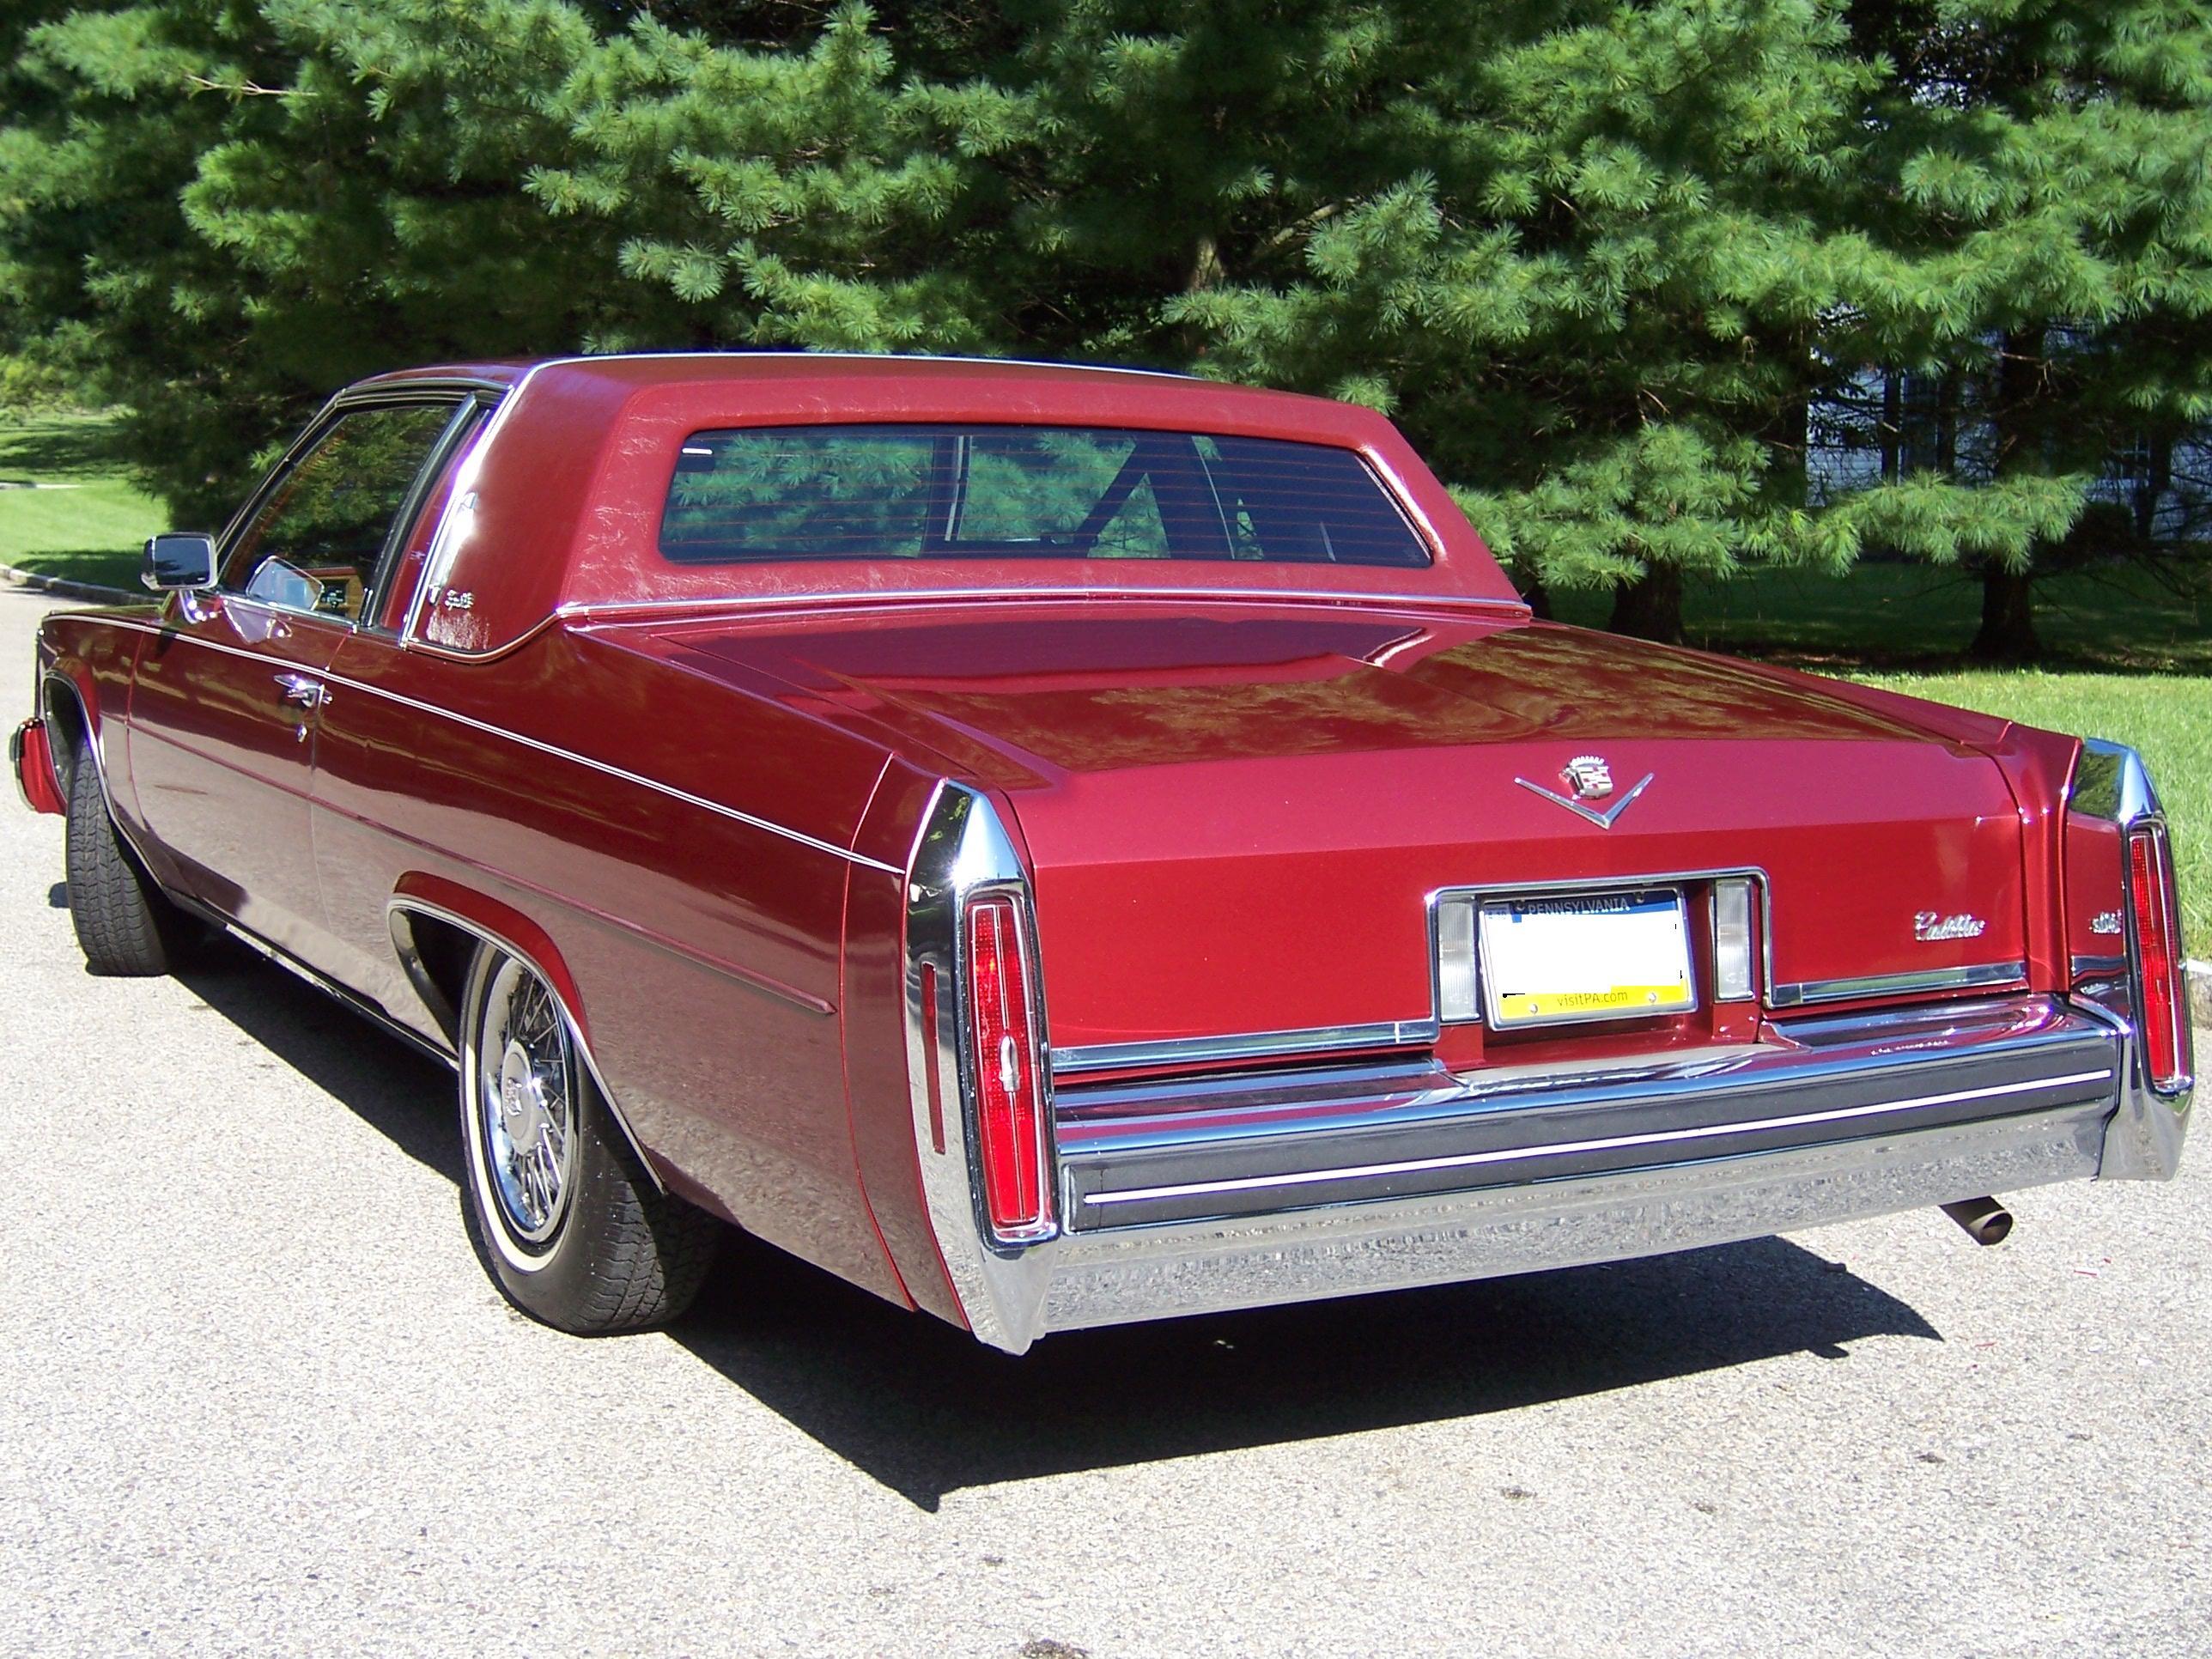 File 1976 cadillac sedan deville interior jpg wikimedia commons - File 1976 Cadillac Sedan Deville Interior Jpg Wikimedia Commons 25